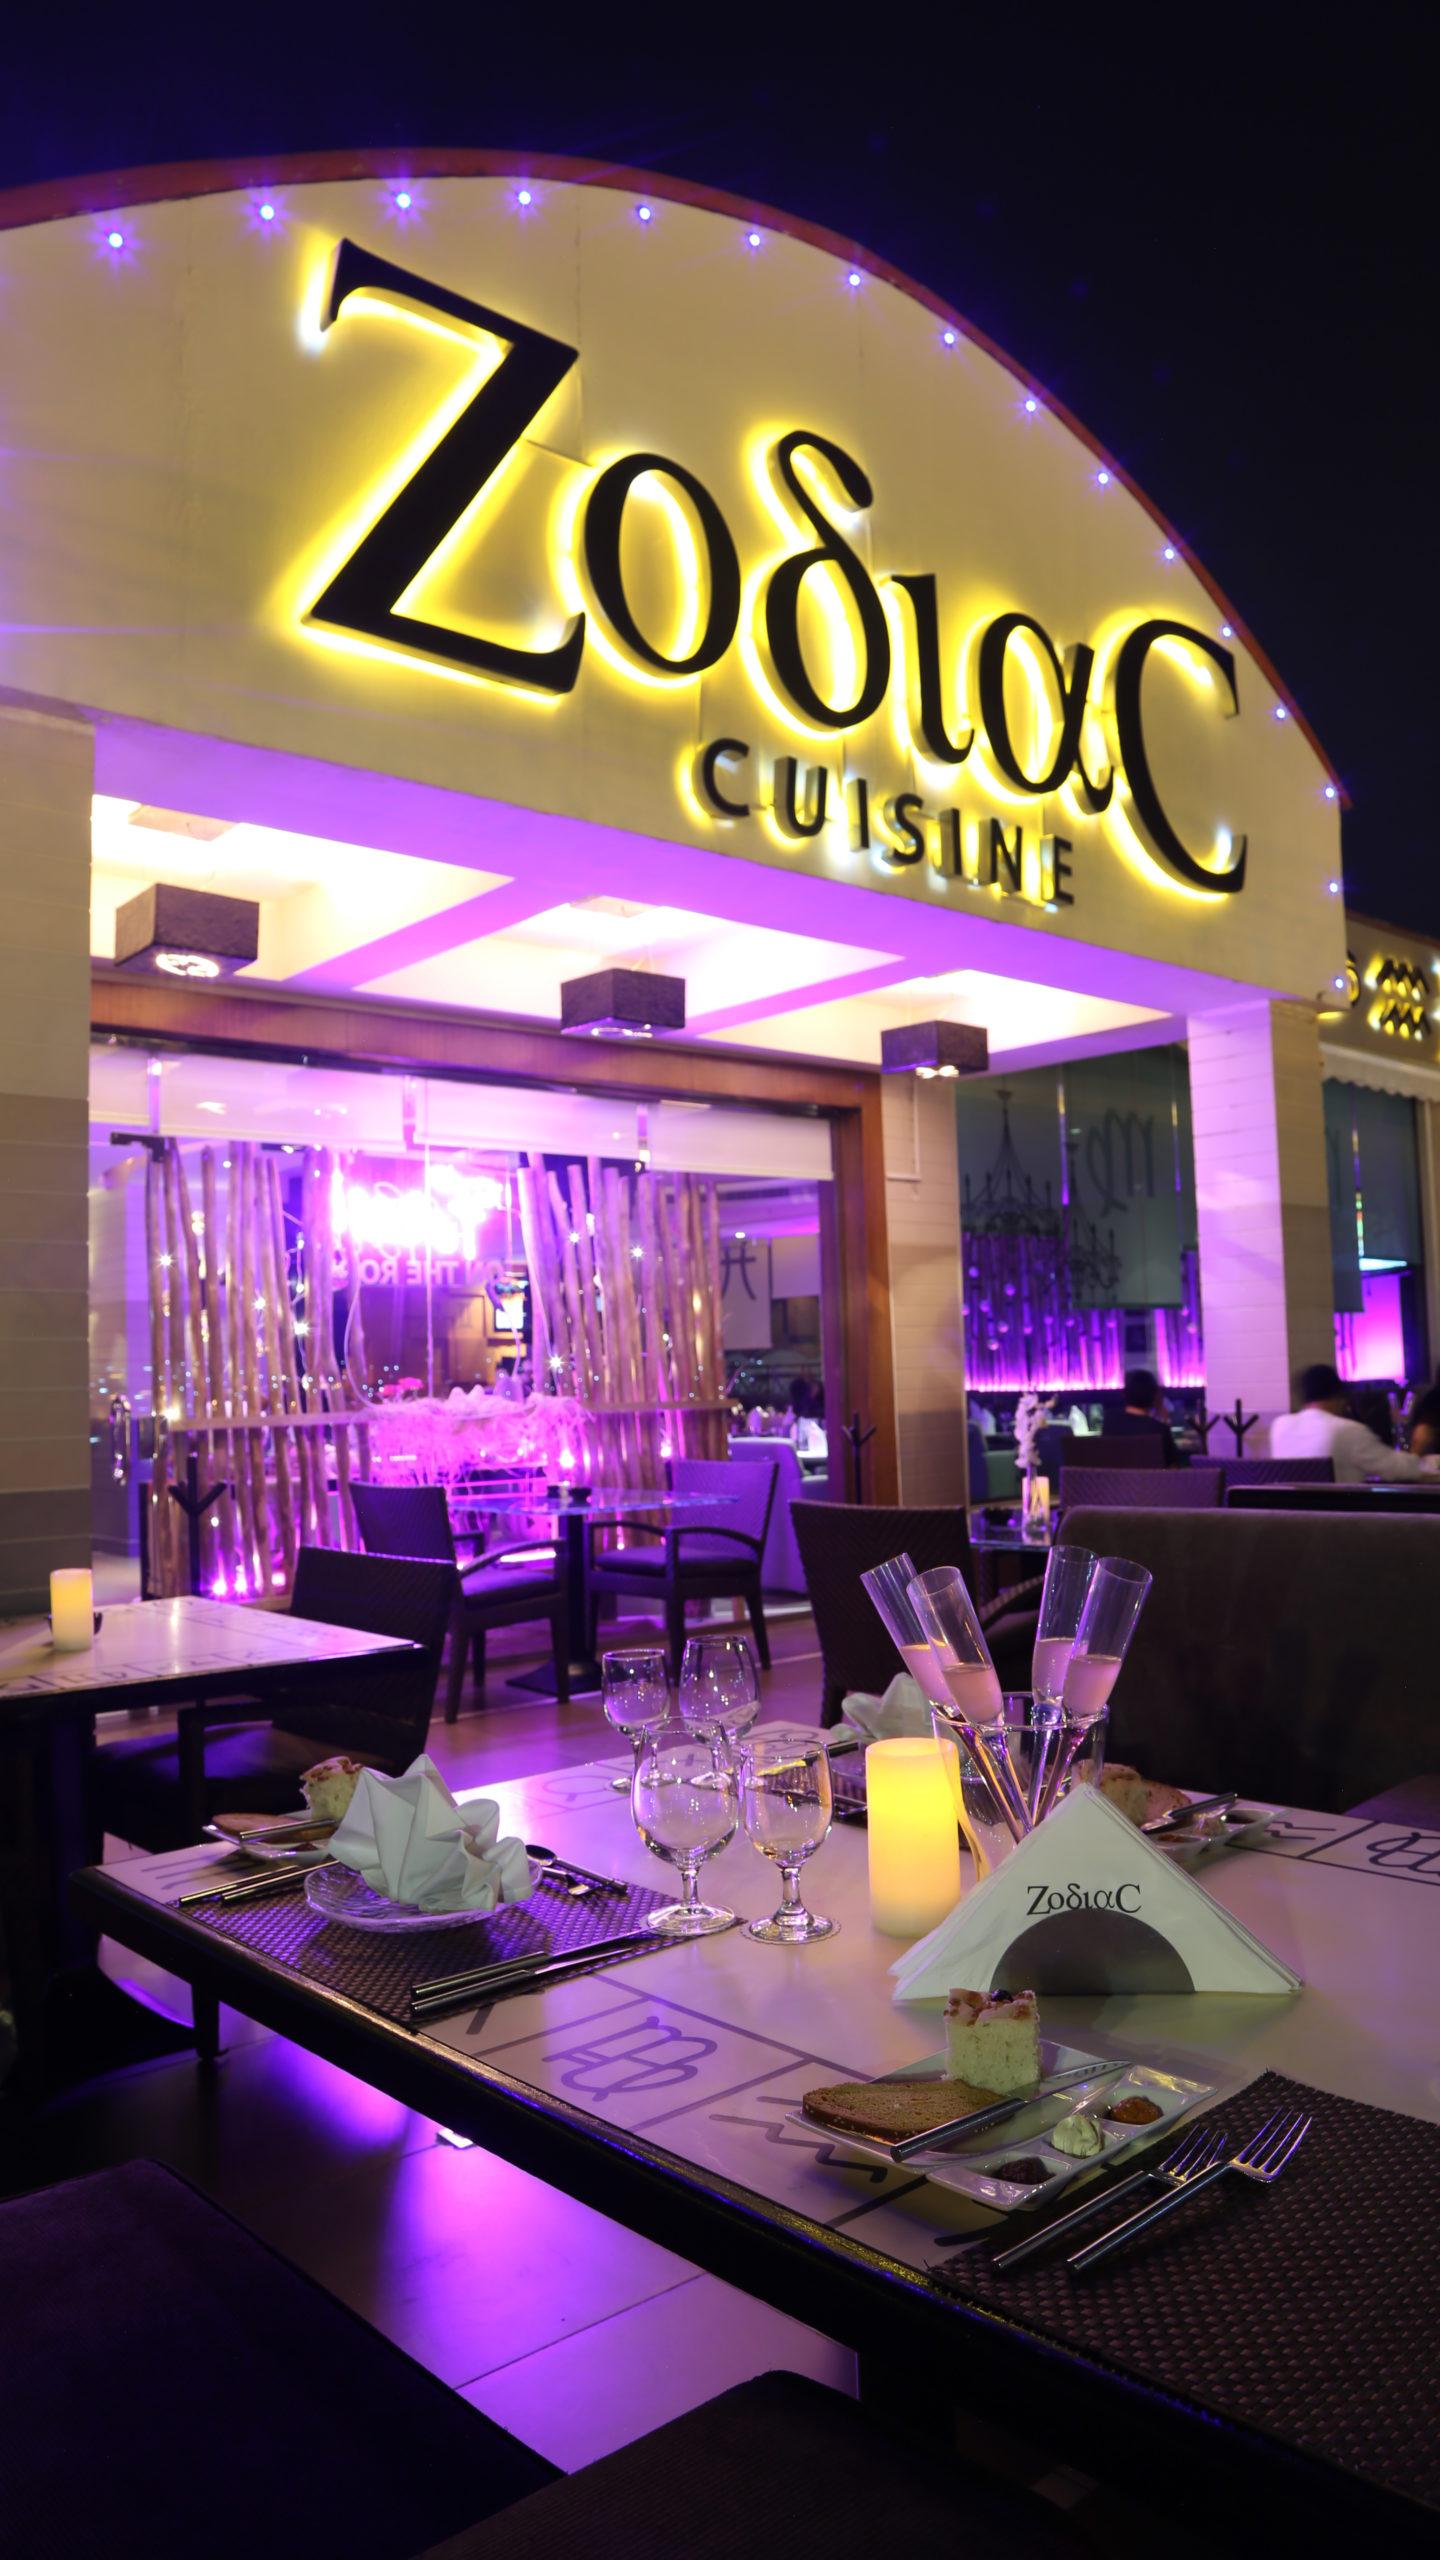 Zodiac Cuisine Terrace